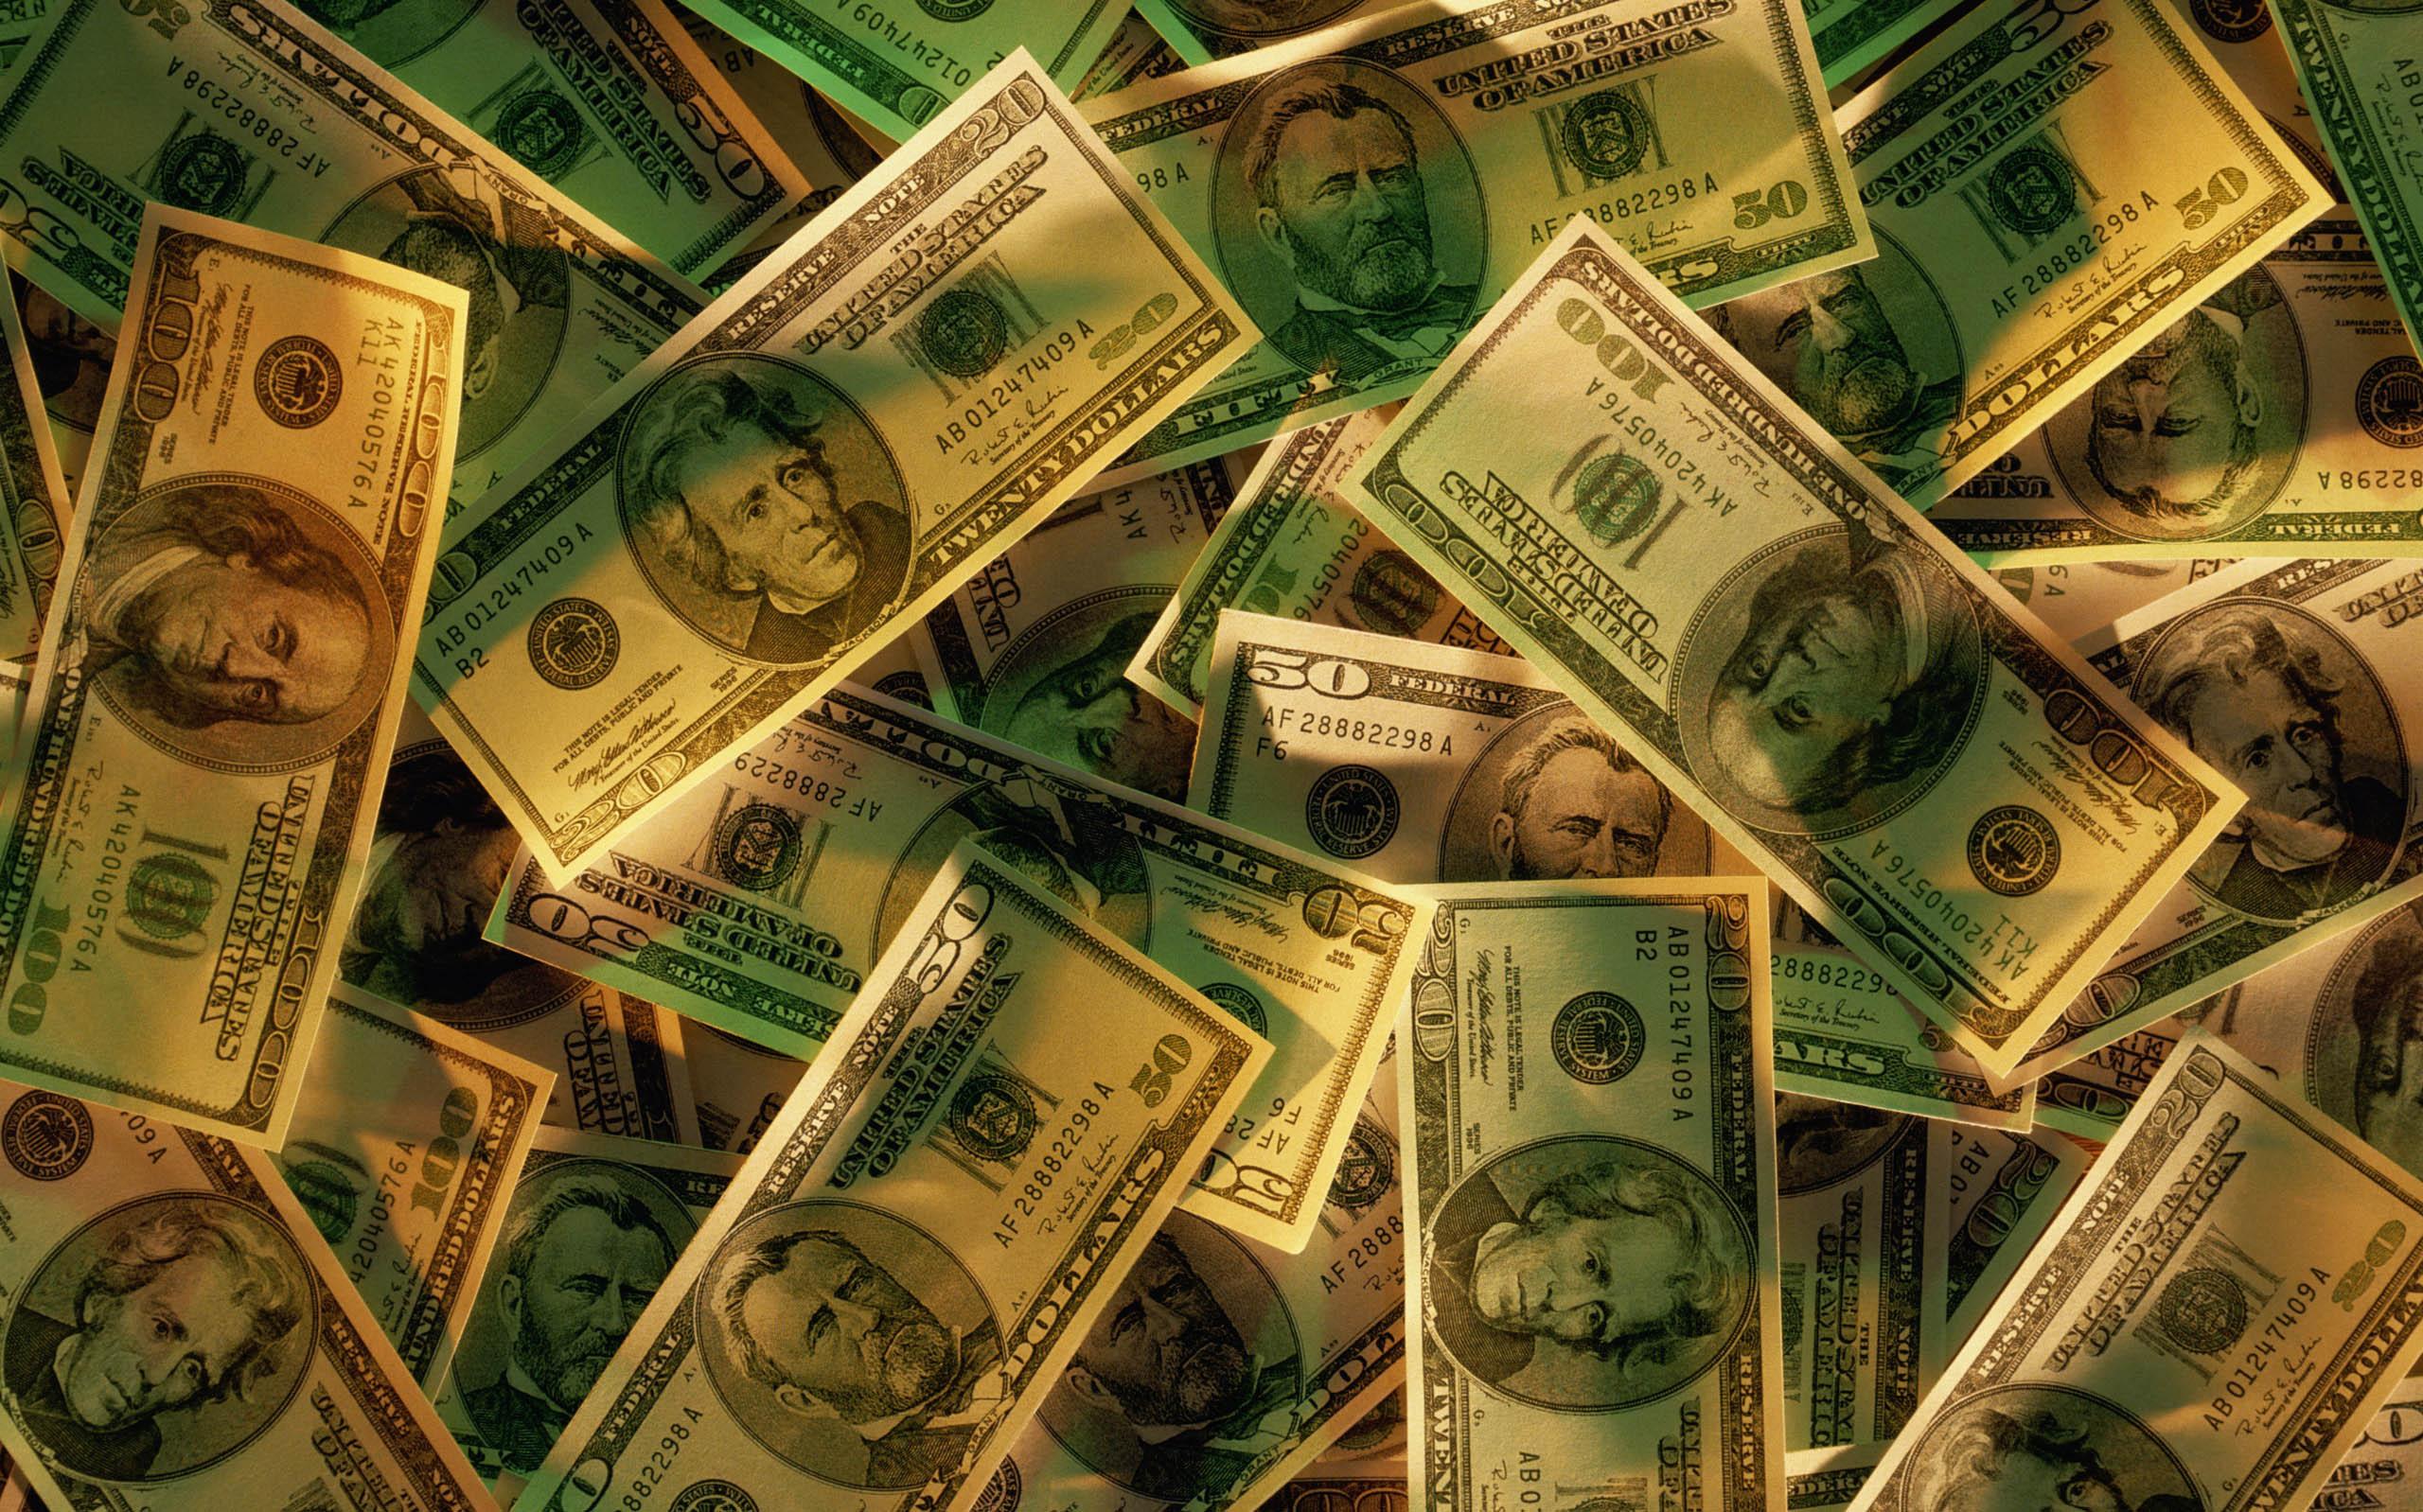 Деньги доллары красивые картинки